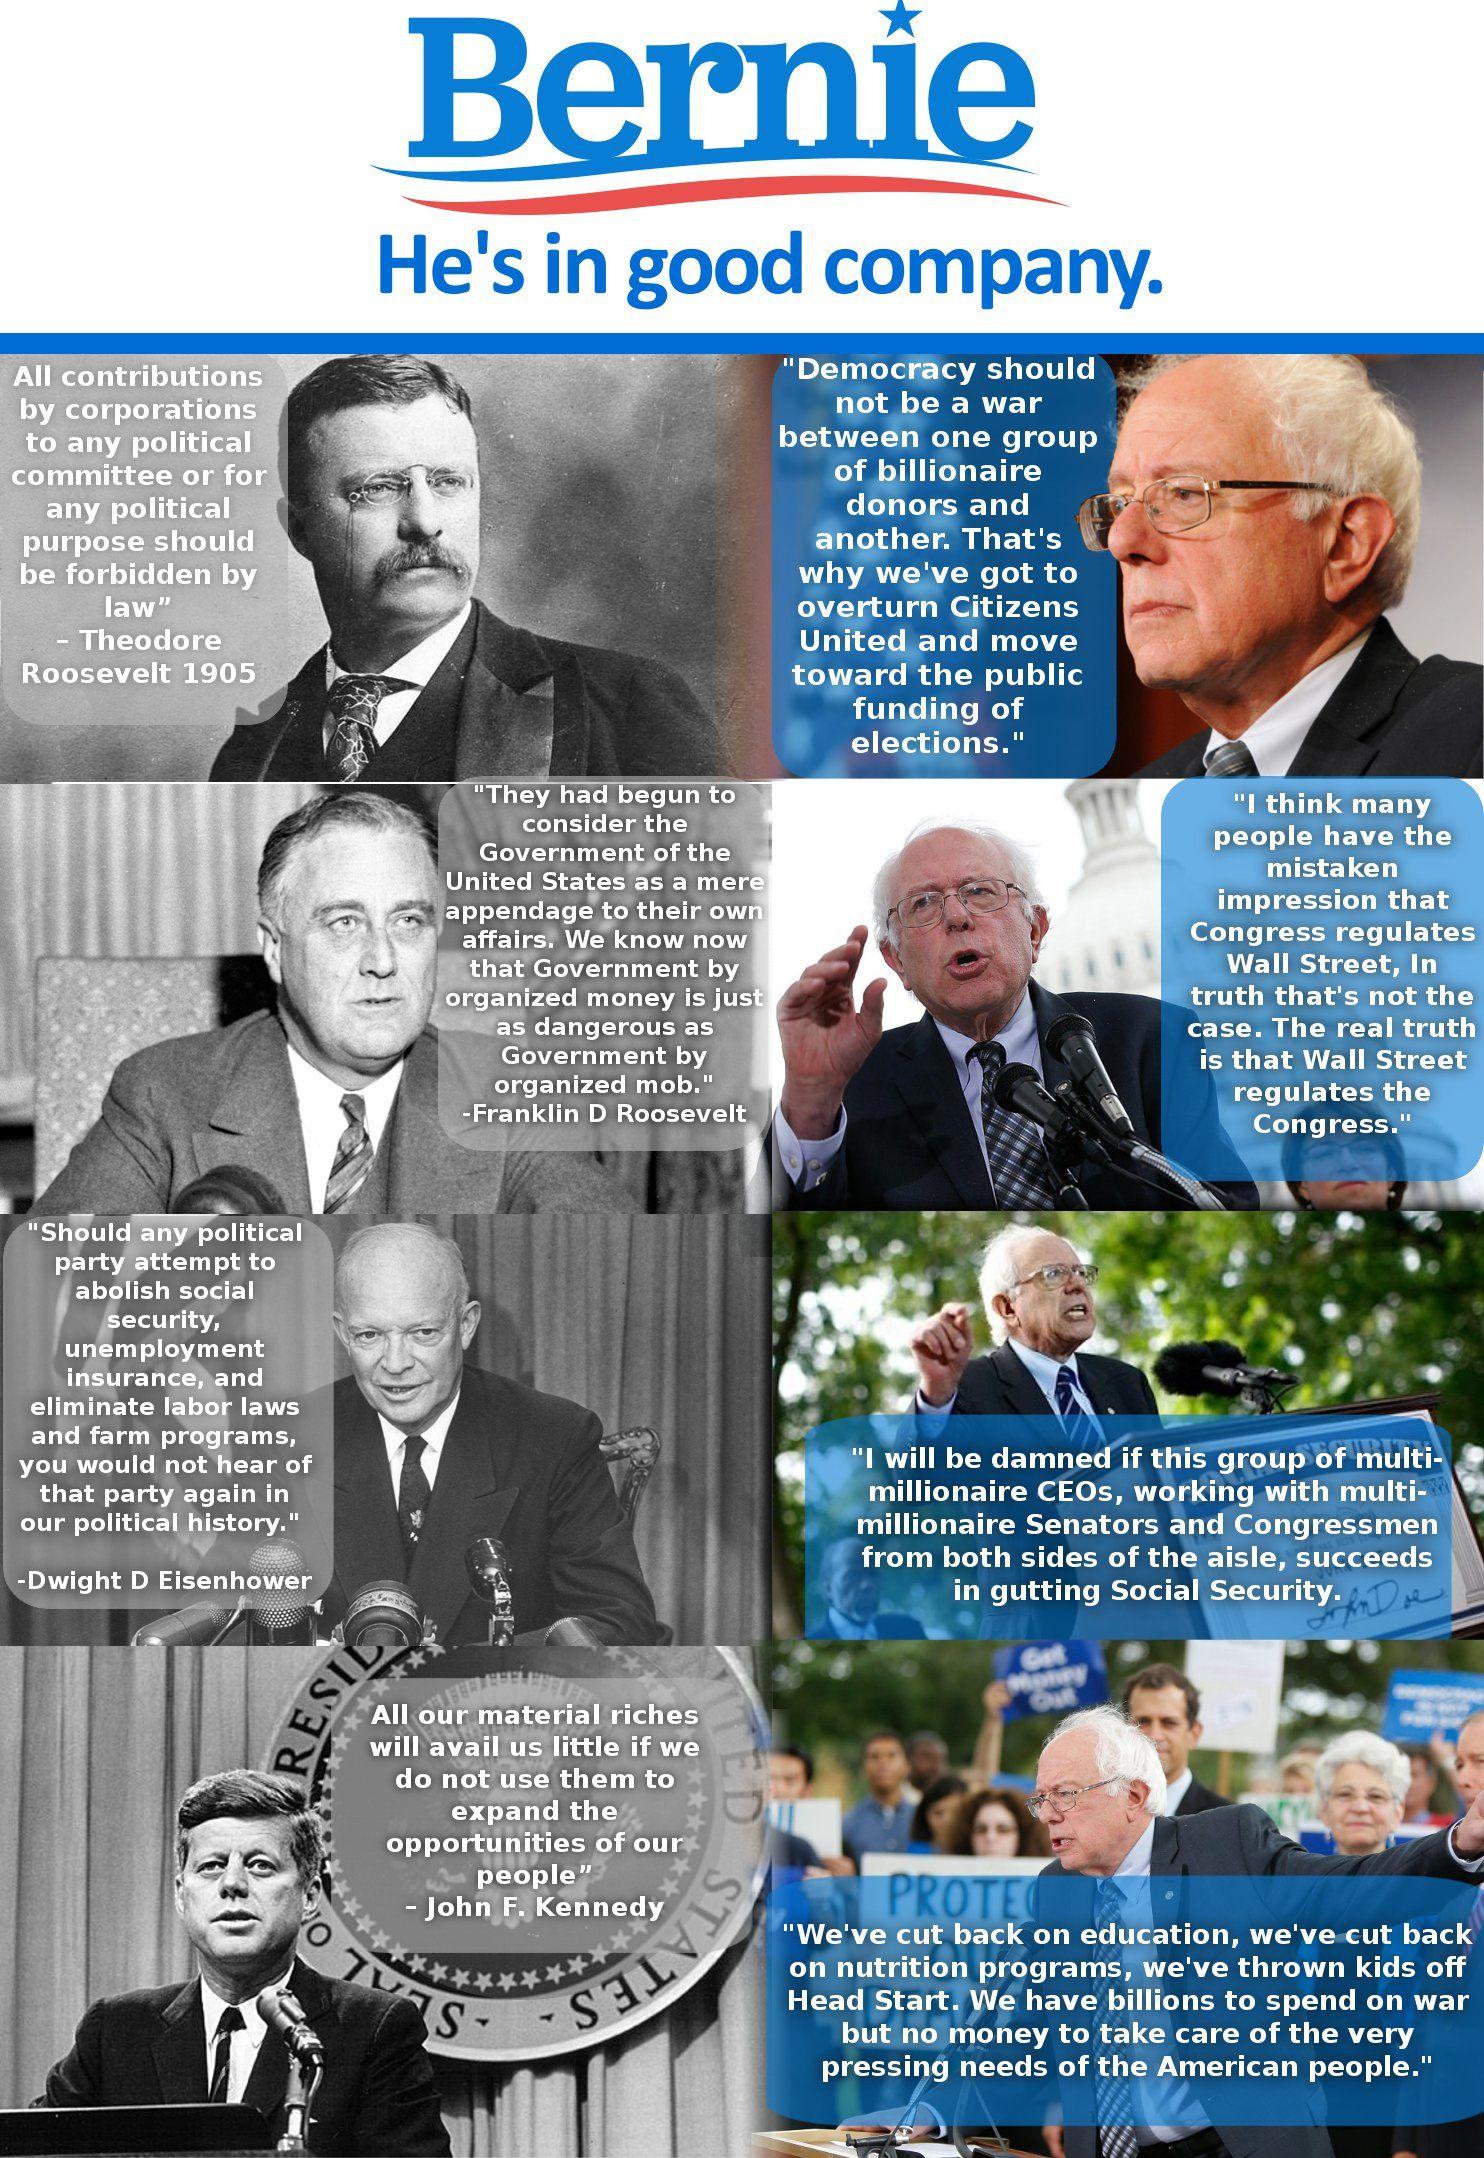 Among the greats, Bernie Sanders